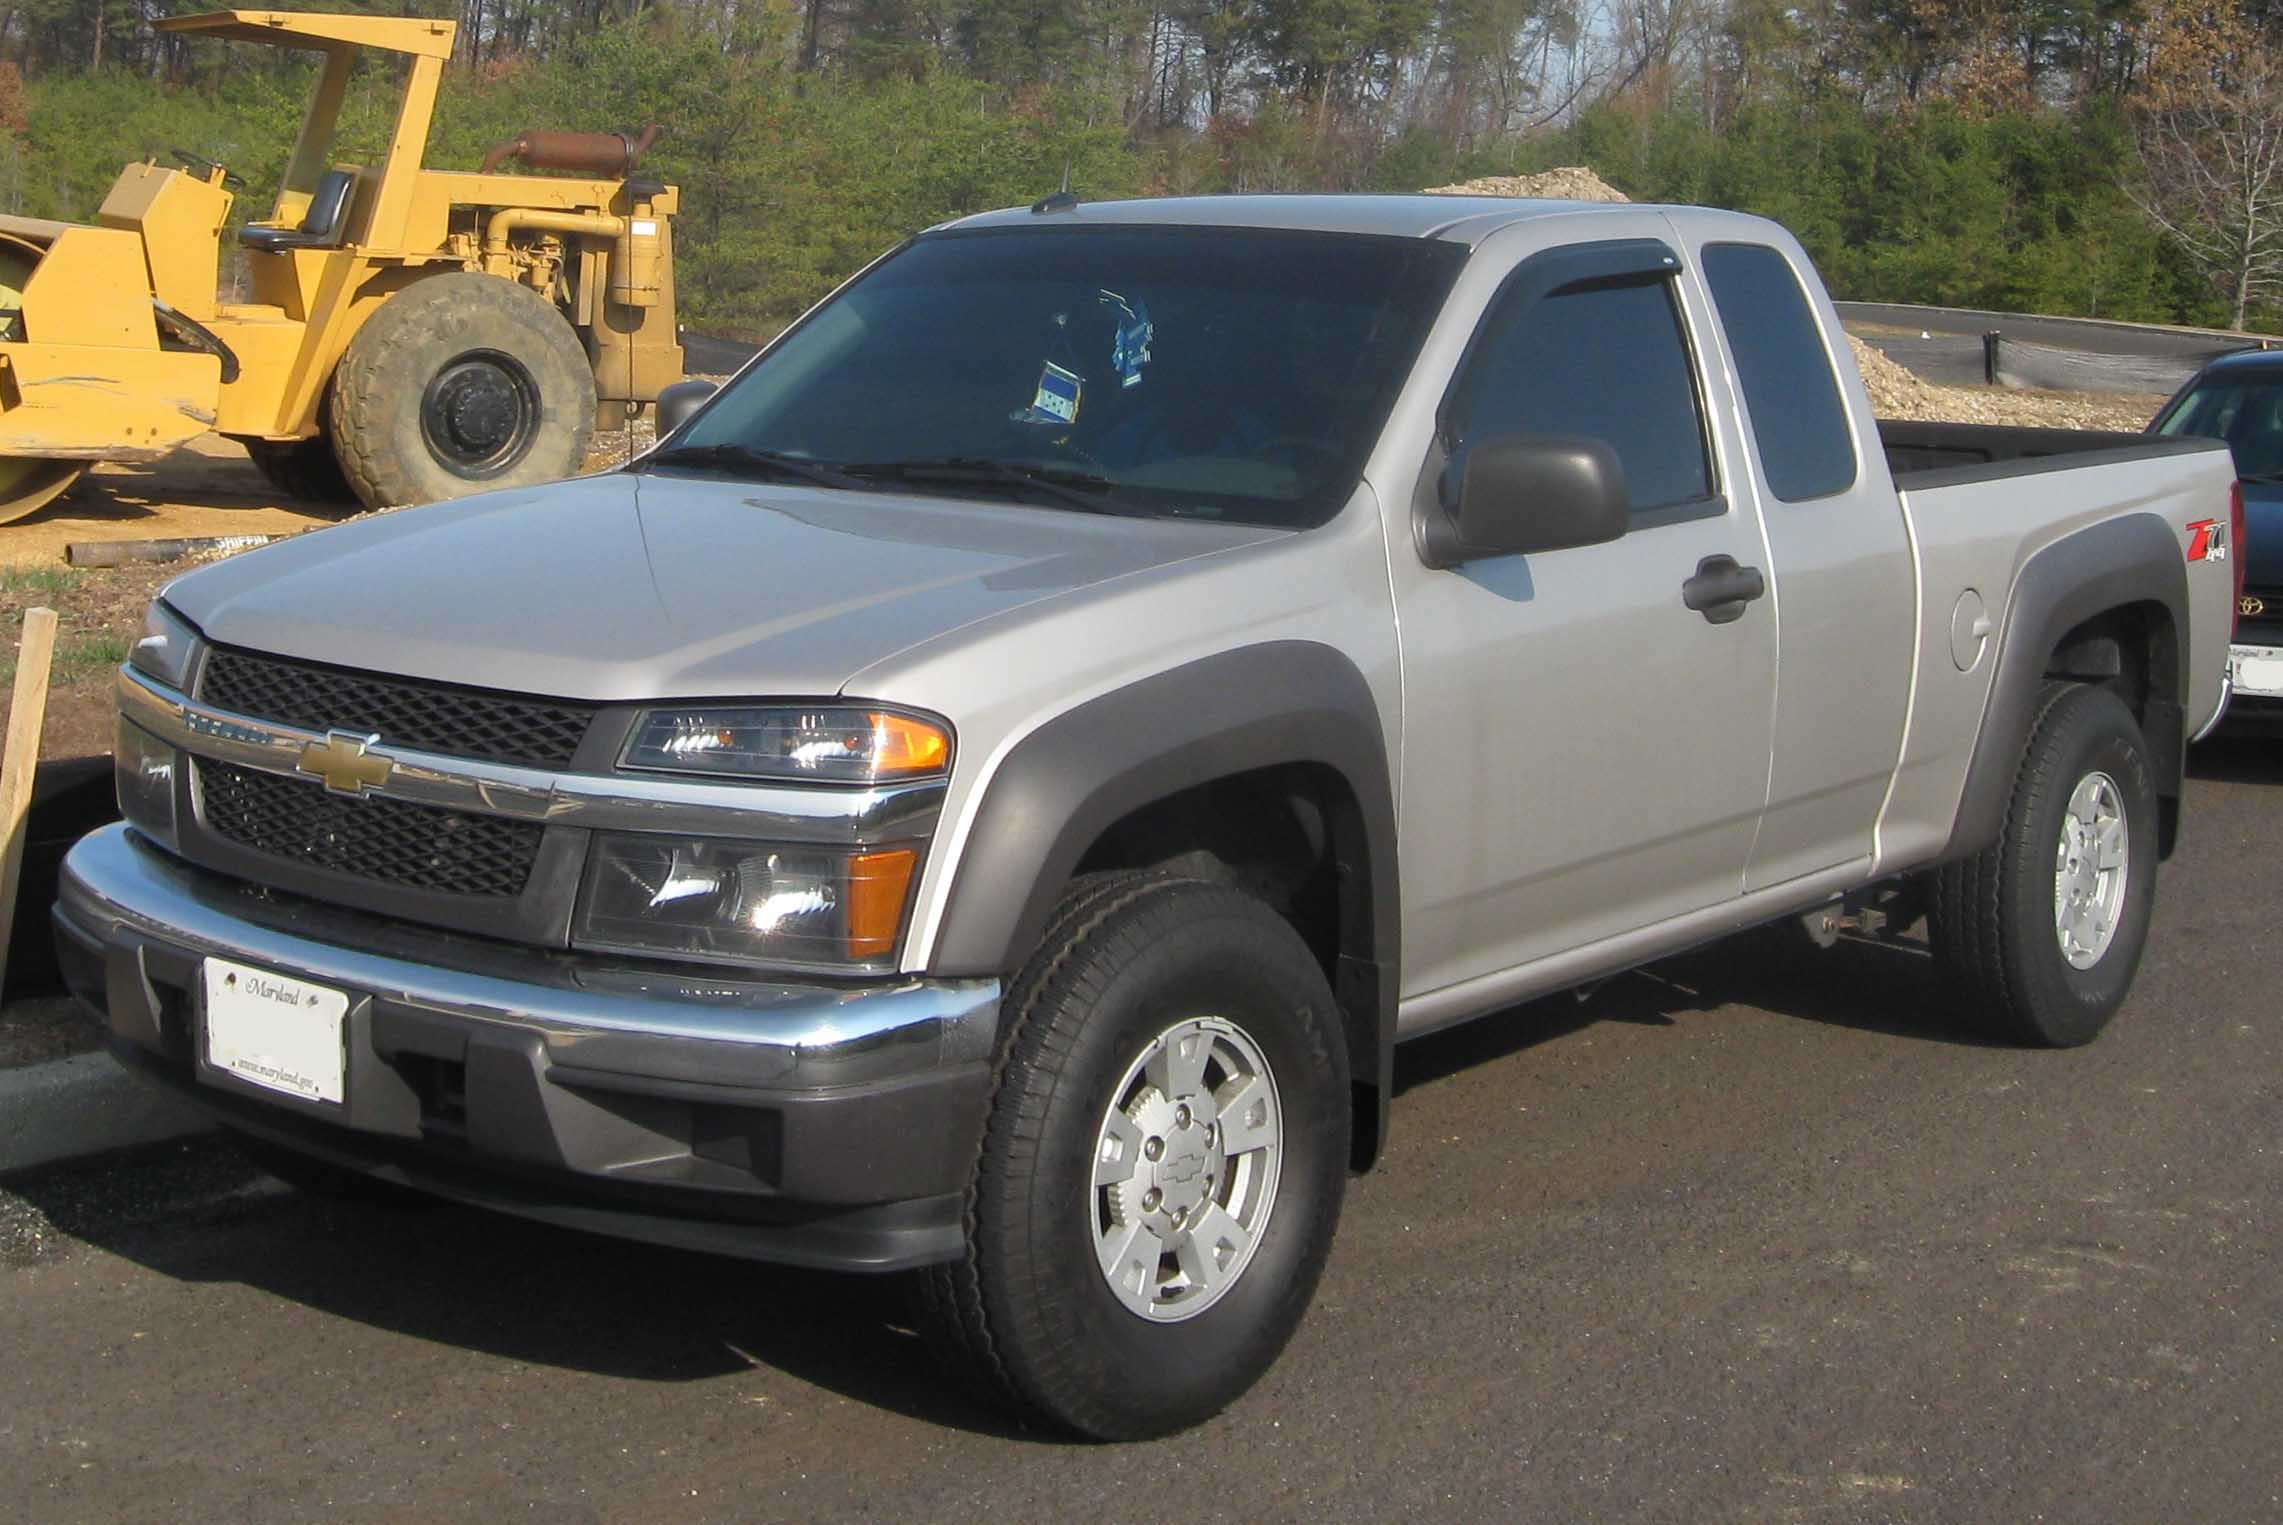 Wiki Chevy Avalanche >> File:Chevrolet Colorado .jpg - Wikimedia Commons